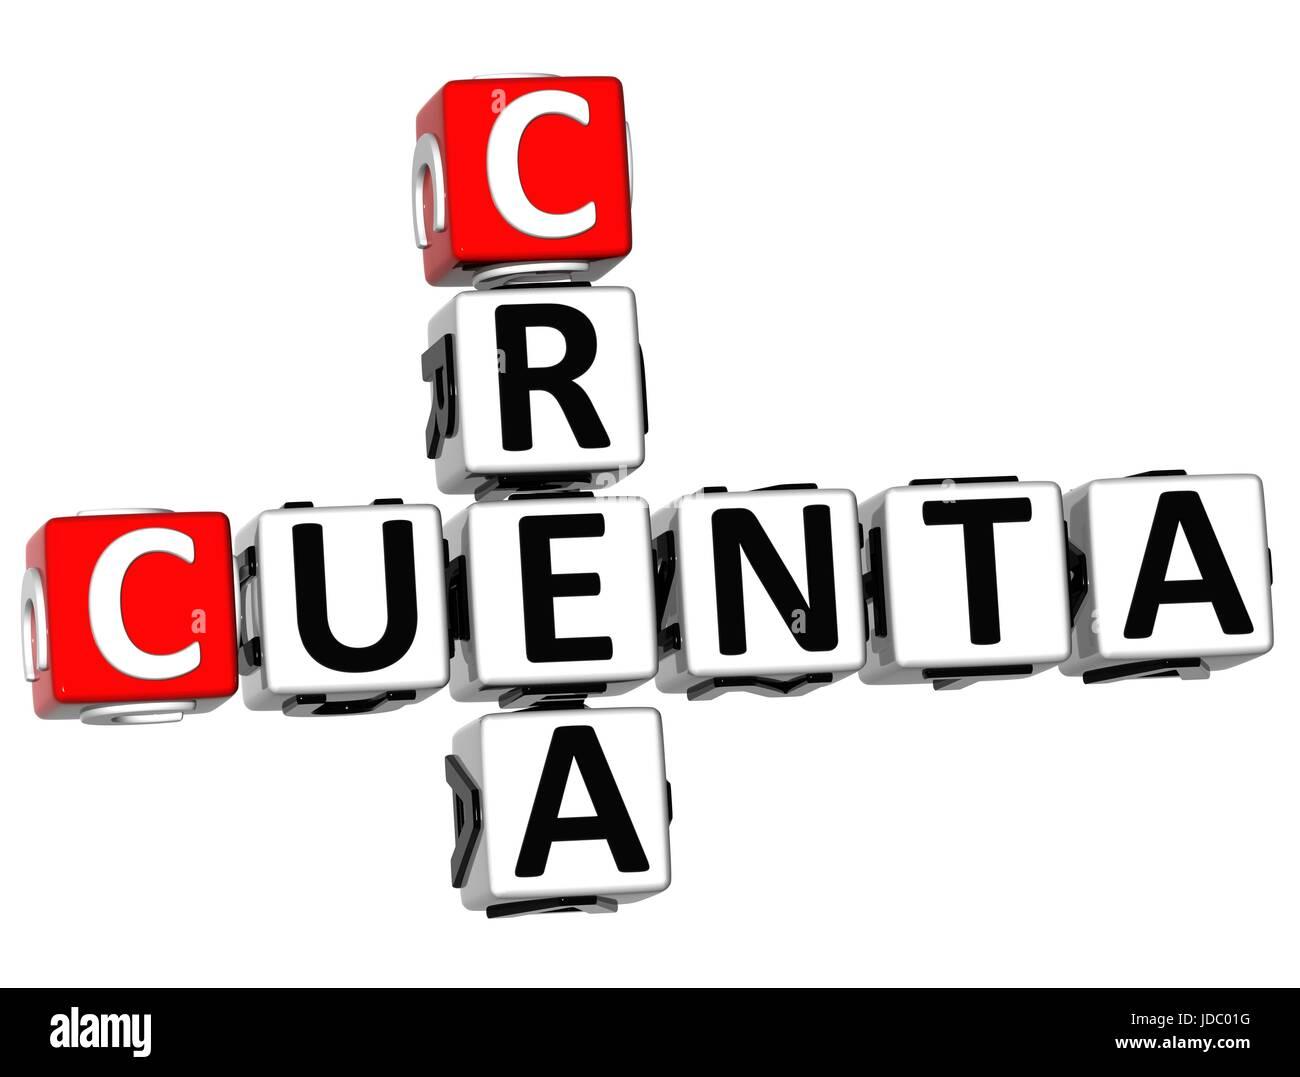 3D Crea Cuenta Crossword on white background - Stock Image